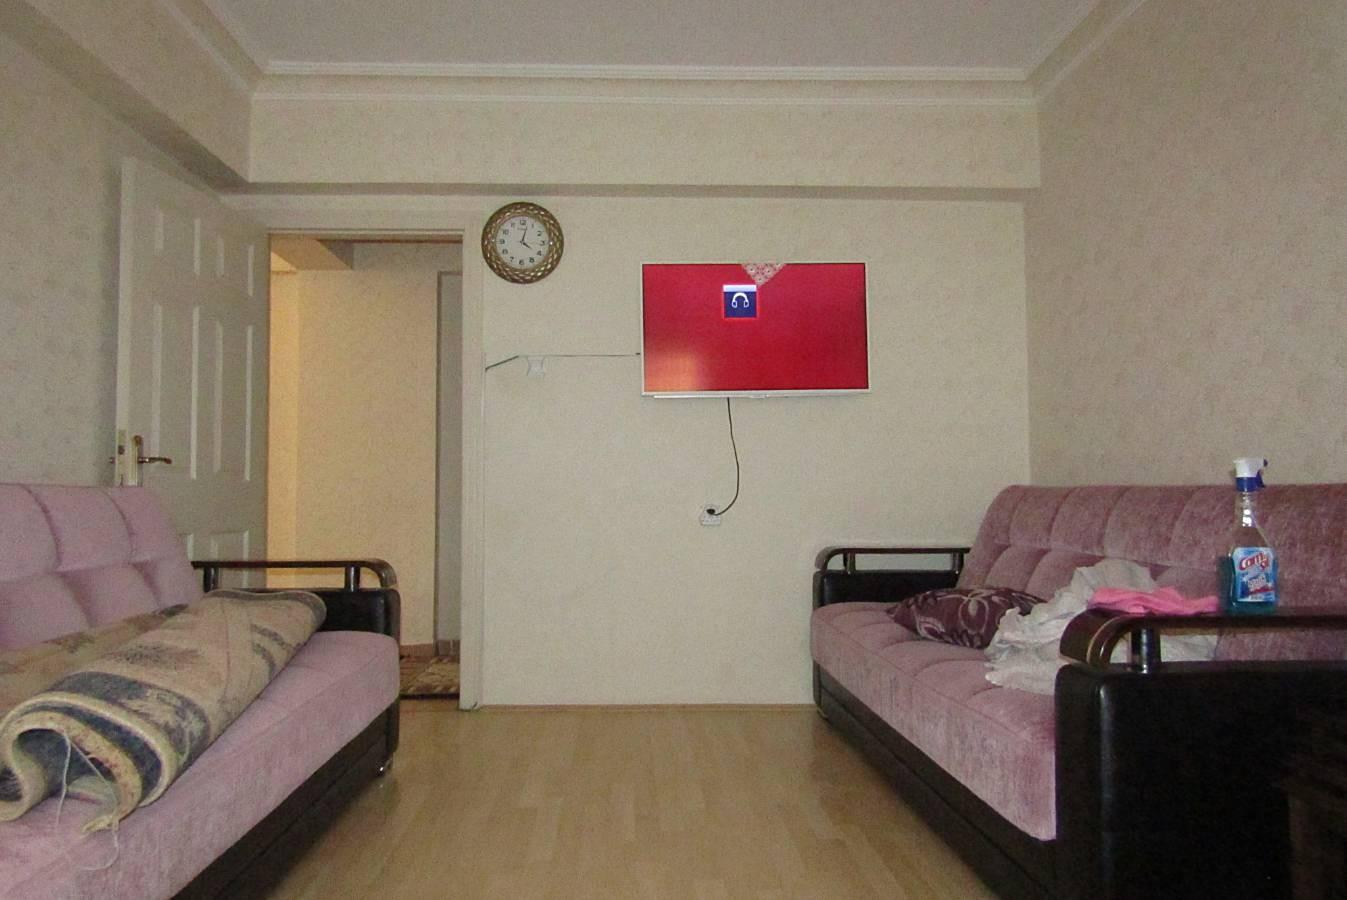 SR EMLAK'TAN PİYADE  MAH'DE 3+1 120m²  ARA KATTA  YAPILI ÖN CEPHE DAİRE